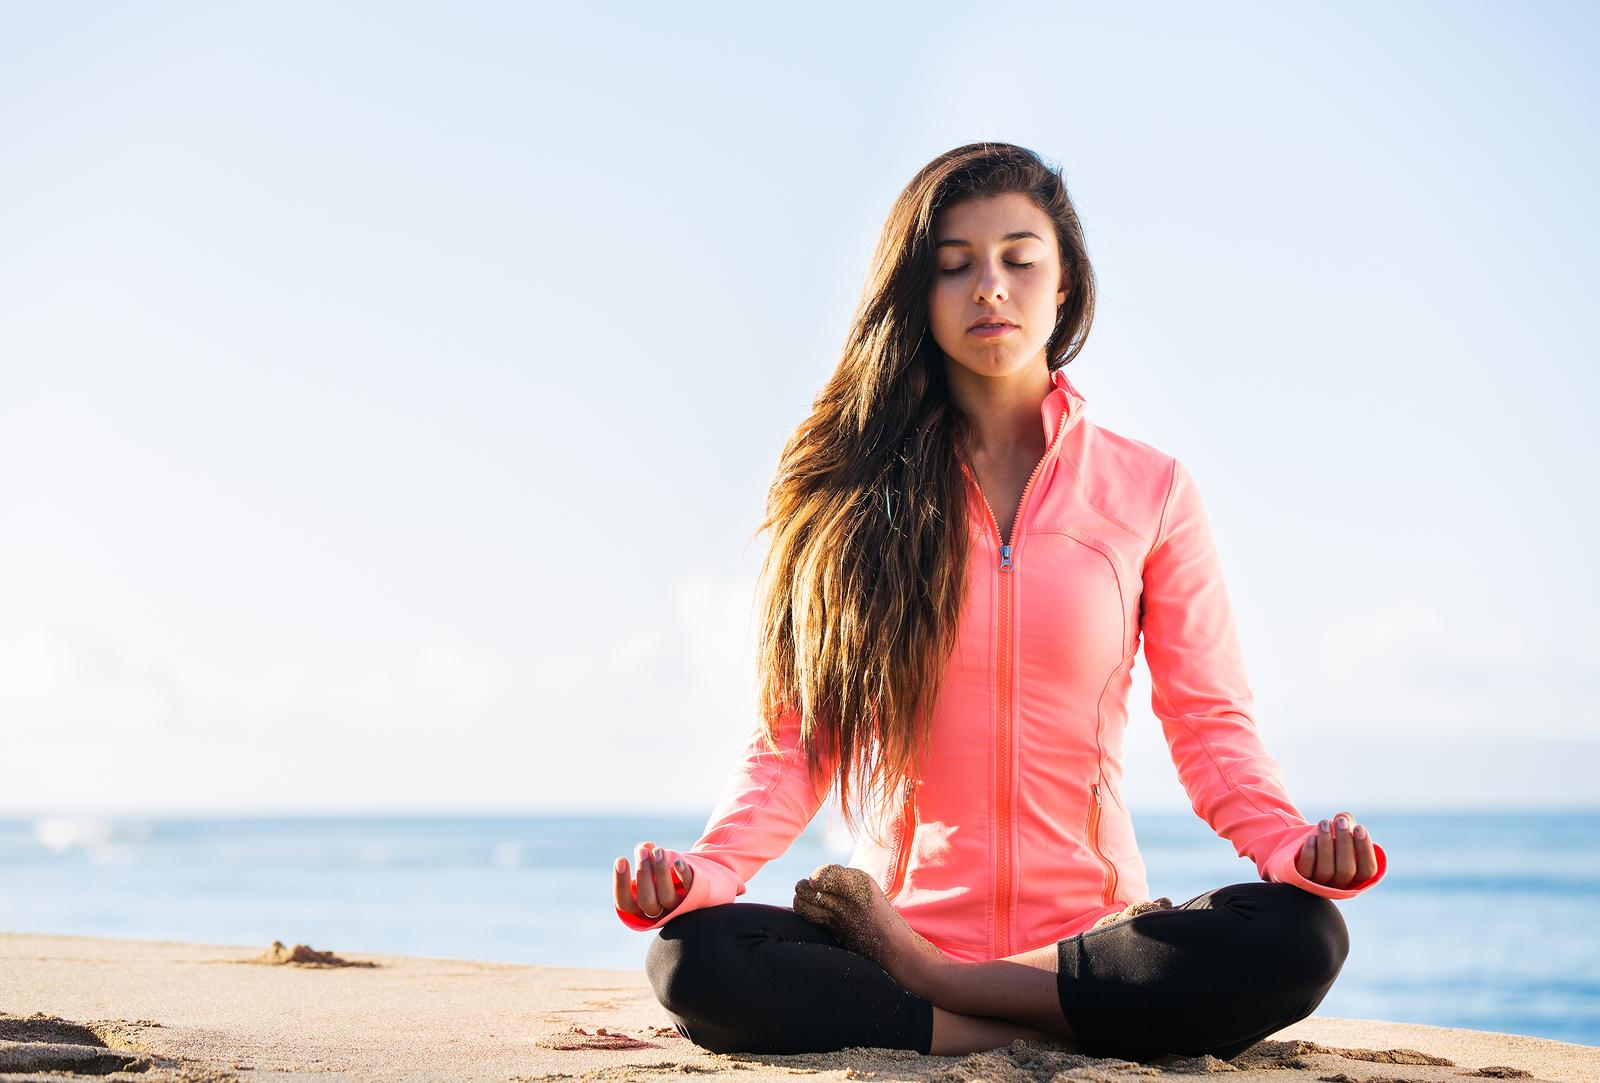 Post Pregnancy Belt - Postpartum Support Belt Can Make Your Hip Joints More Stable!